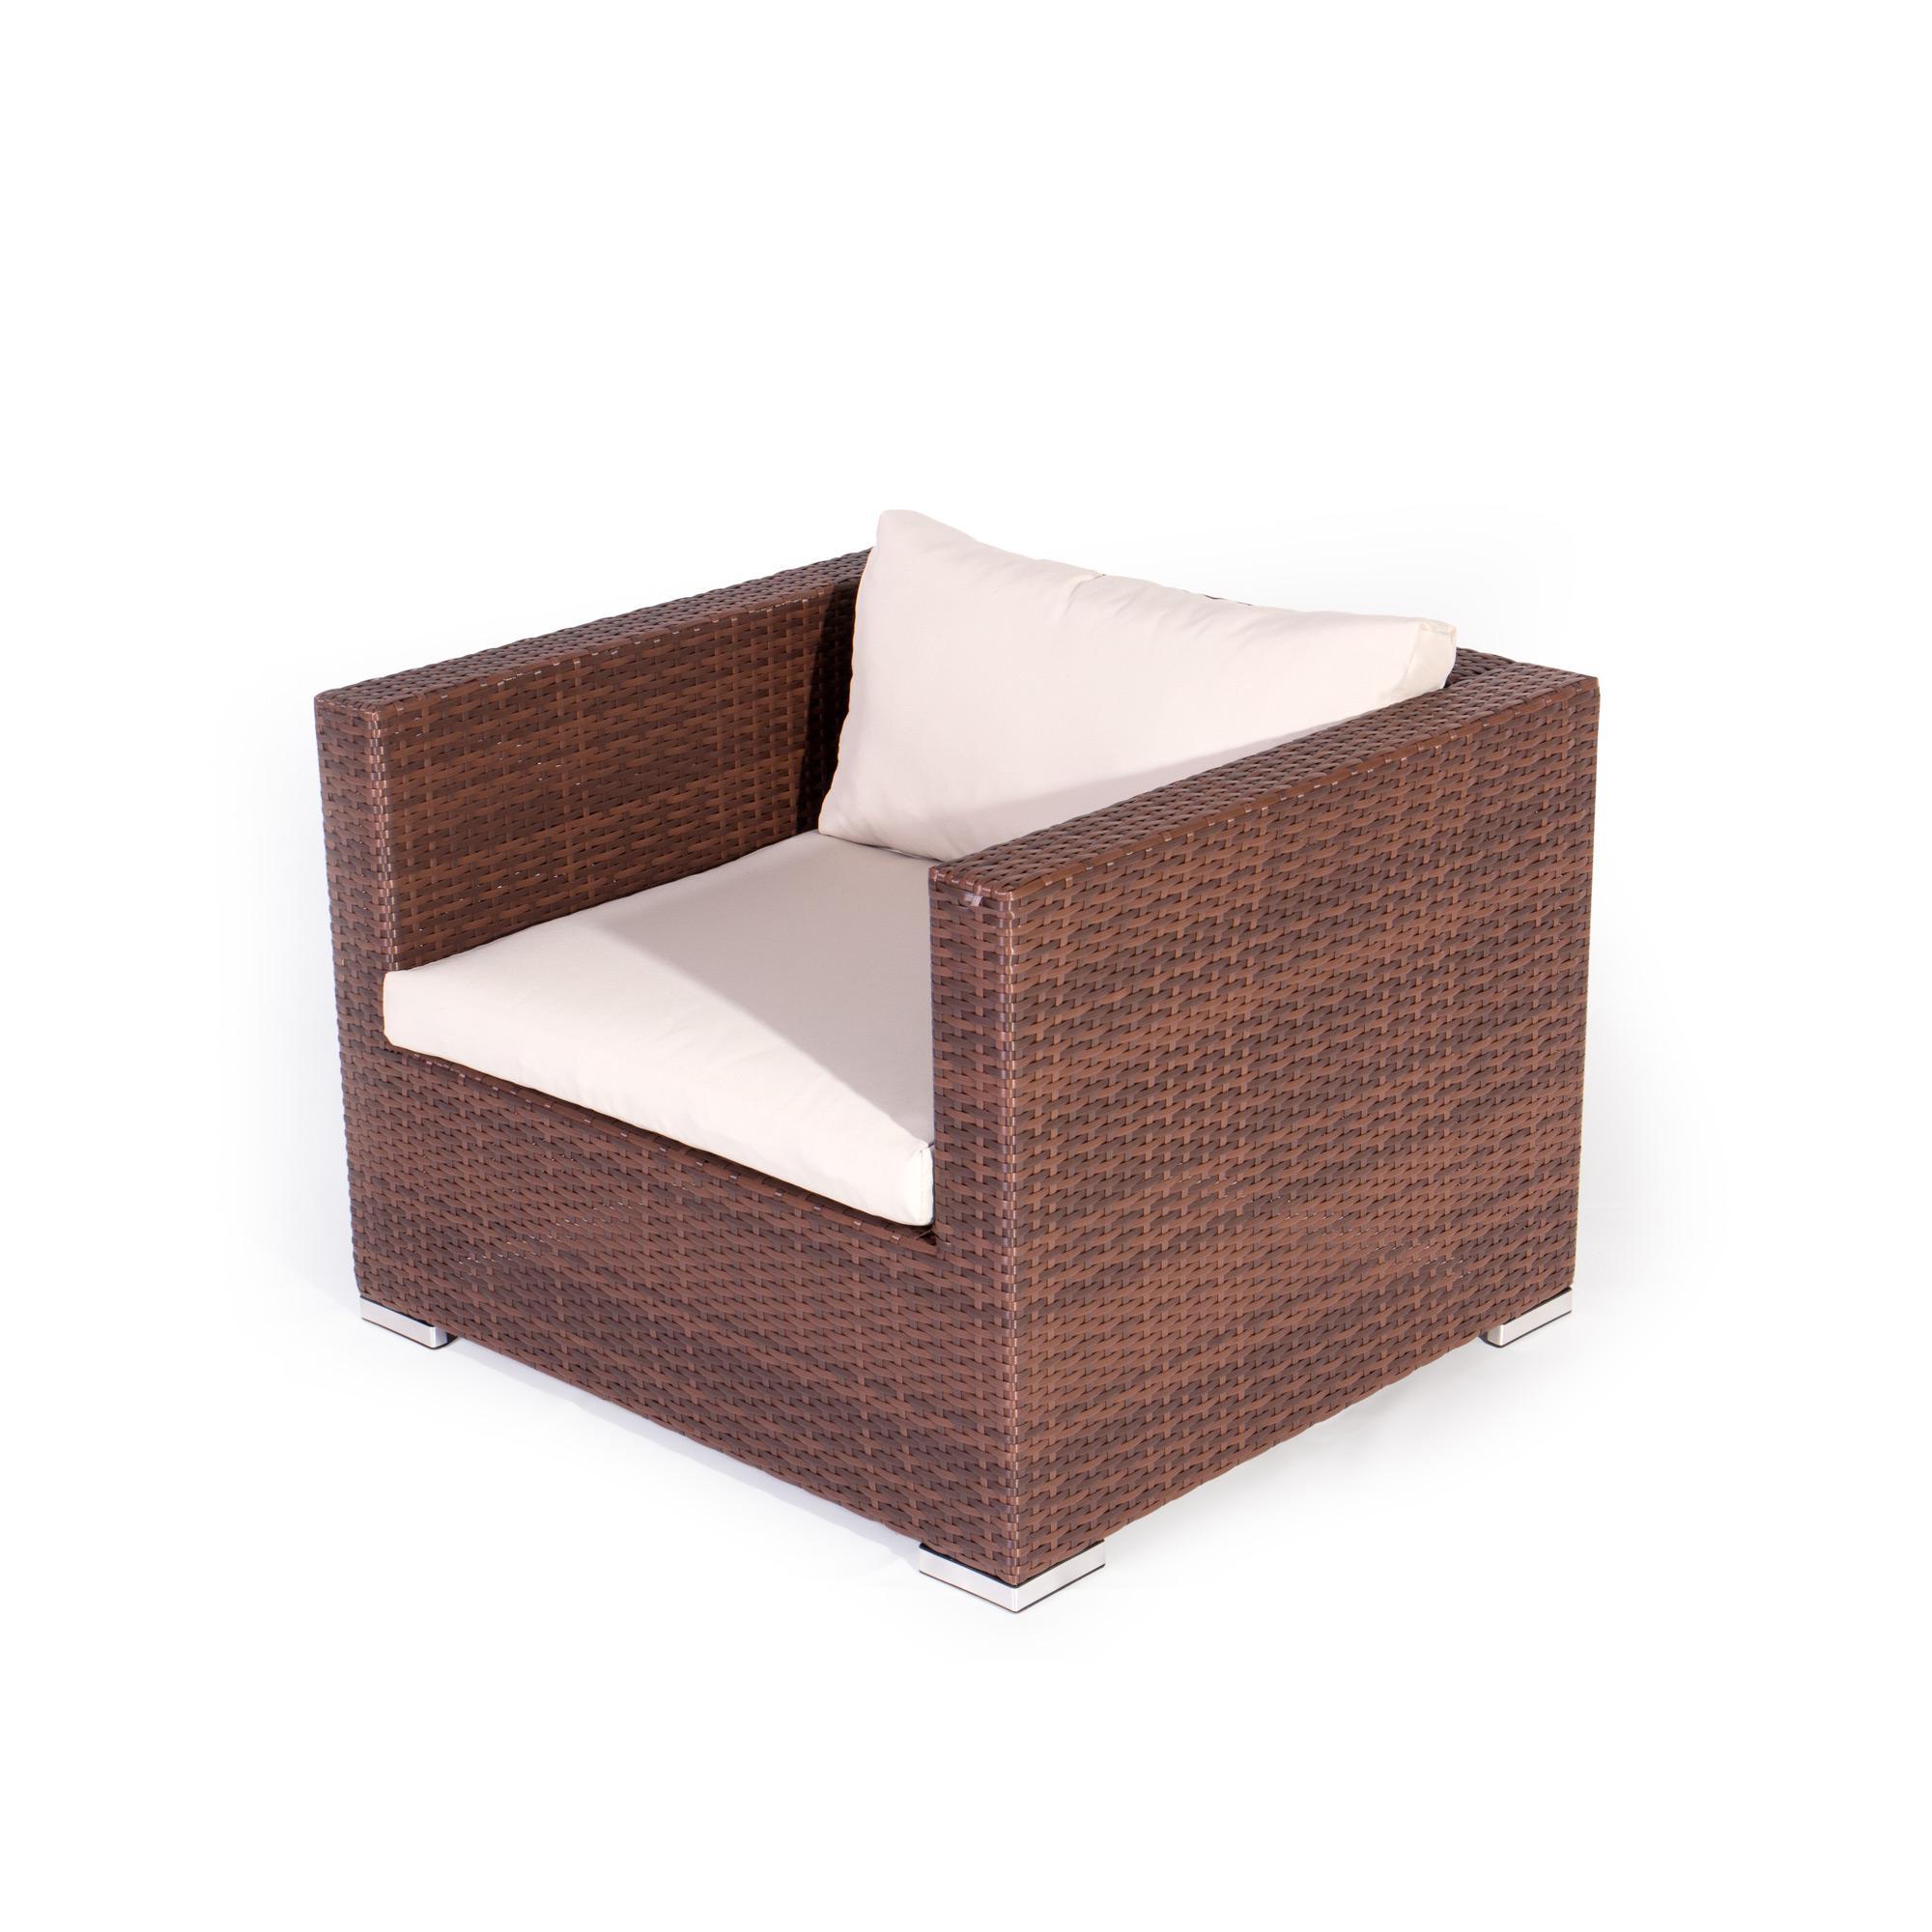 vanage kapstadt gartenm bel set xxxl sch ne polyrattan gartengarnitur outdoor m bel. Black Bedroom Furniture Sets. Home Design Ideas